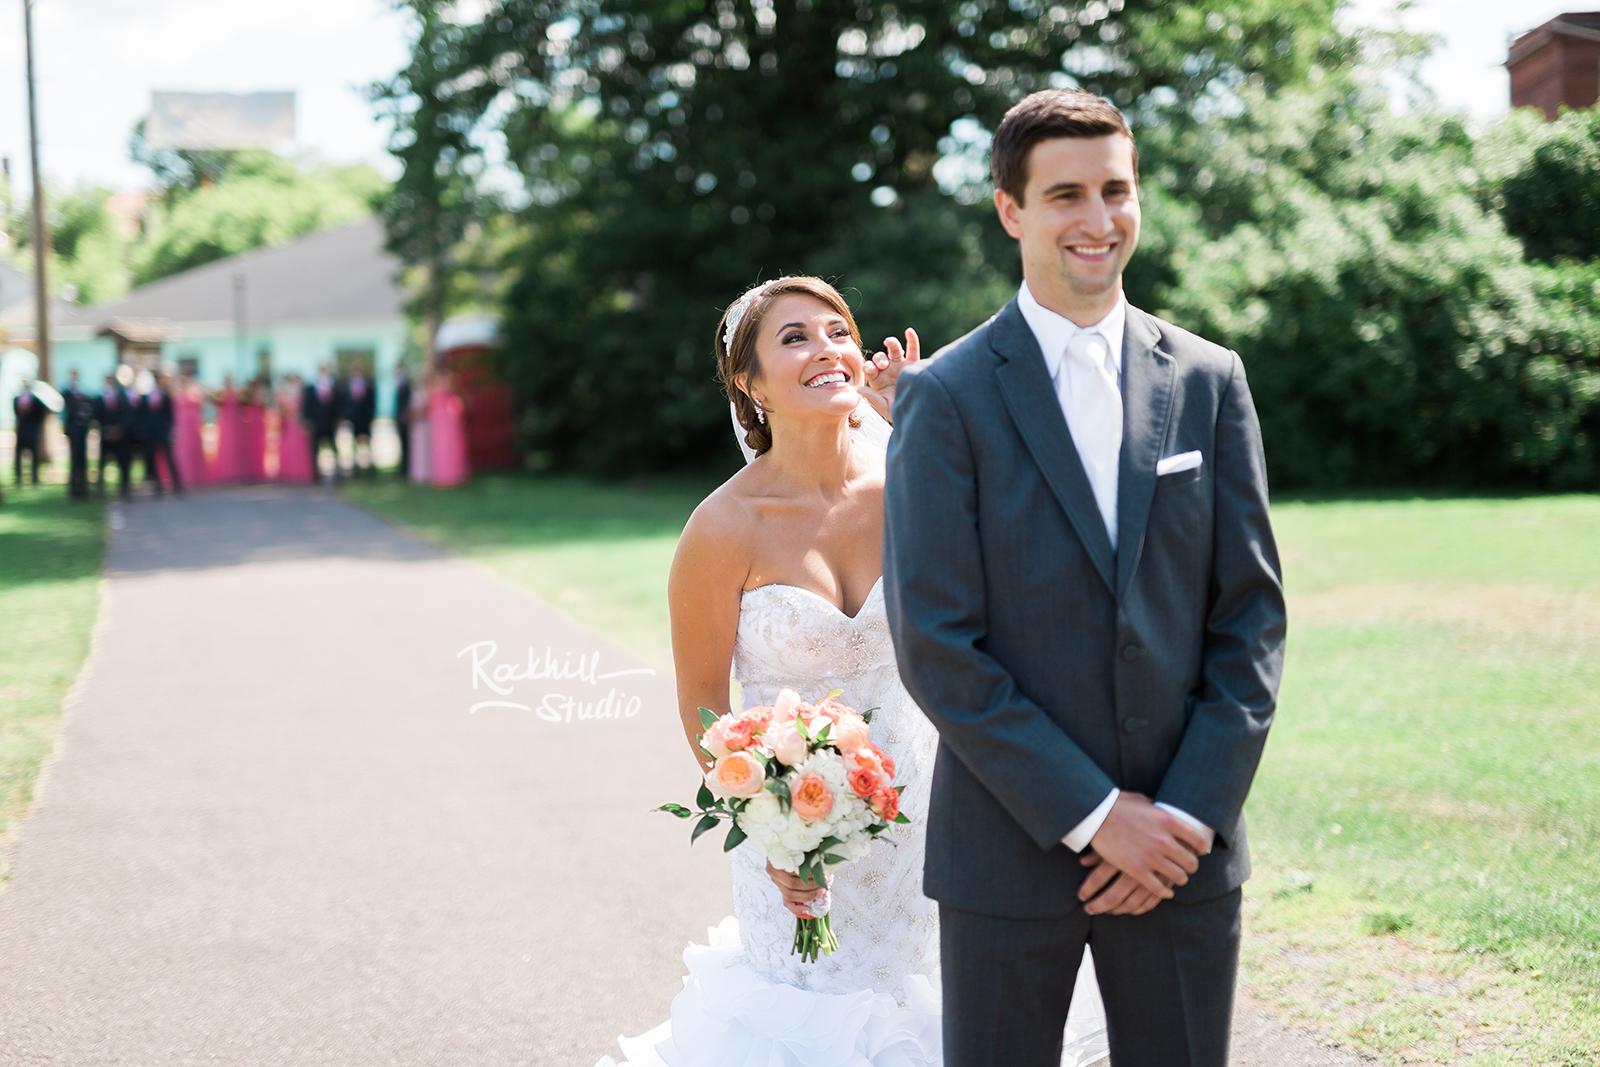 marquette-wedding-upper-peninsula-northern-michigan-wedding-ck-photography-firstlook-1.jpg